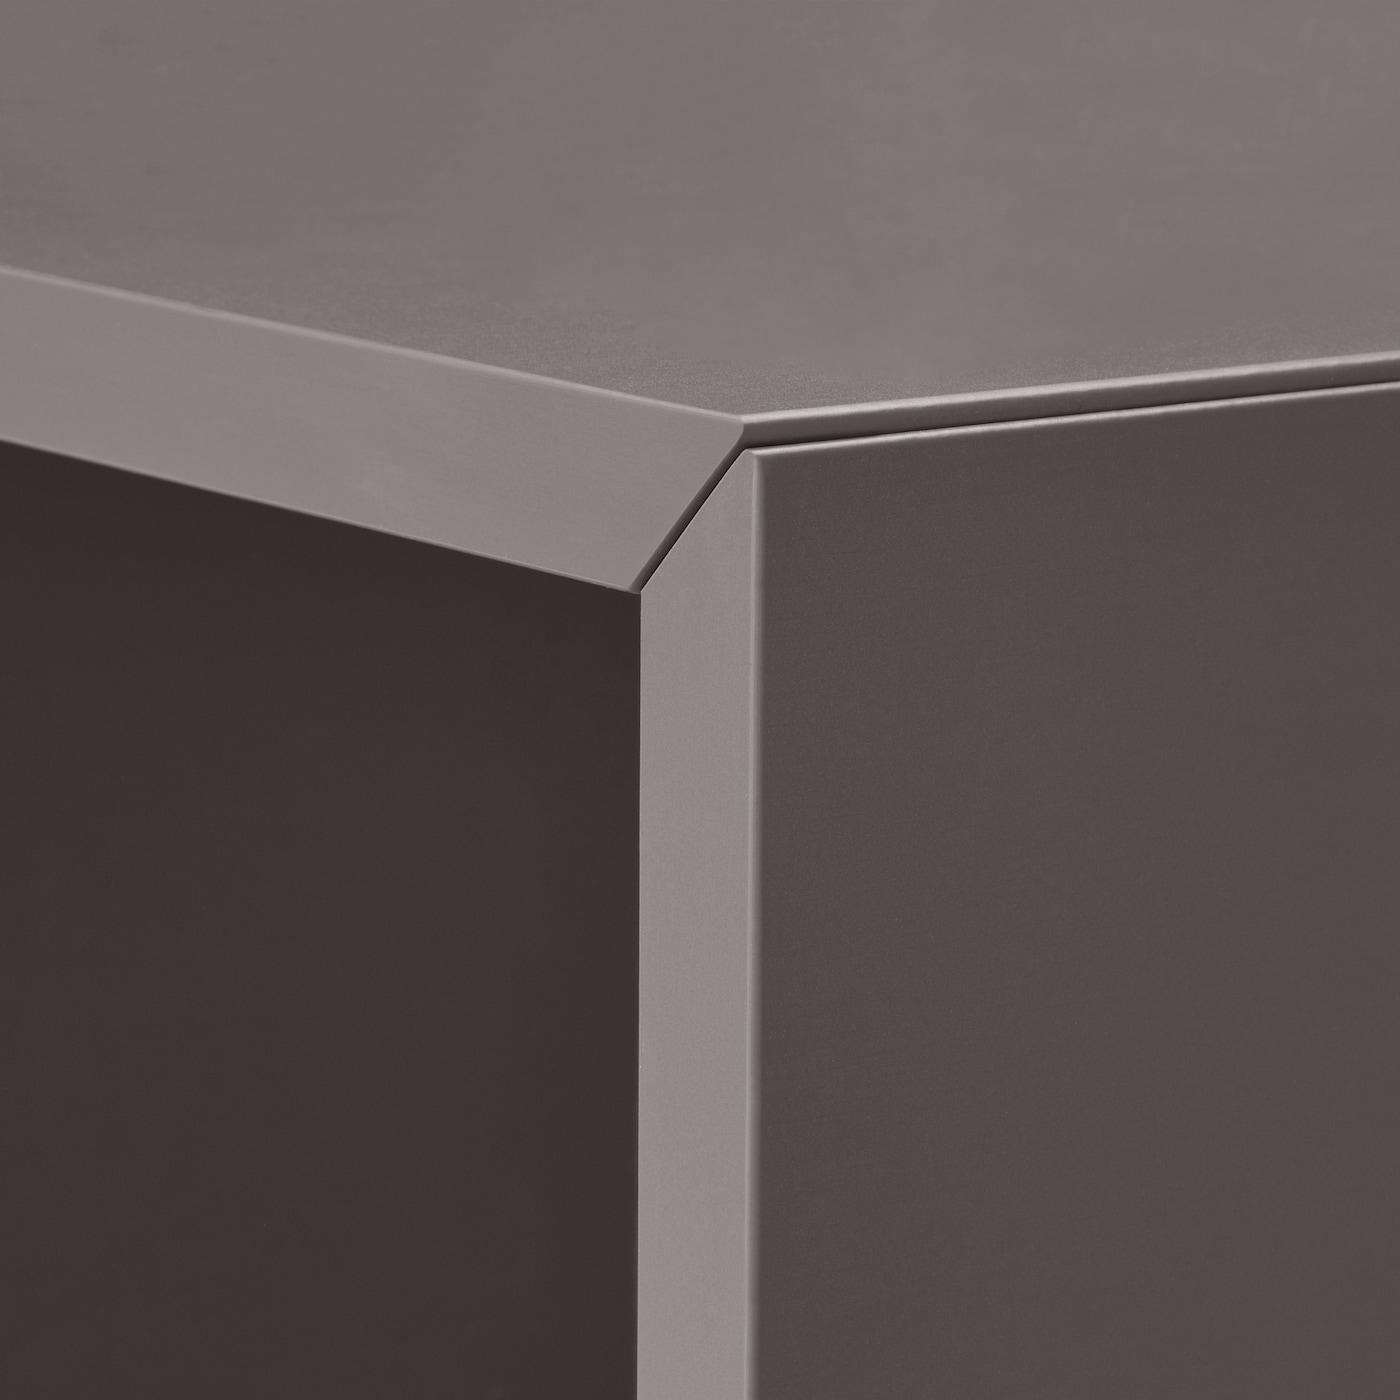 EKET Open kast wandmontage, donkergrijs, 35x25x35 cm